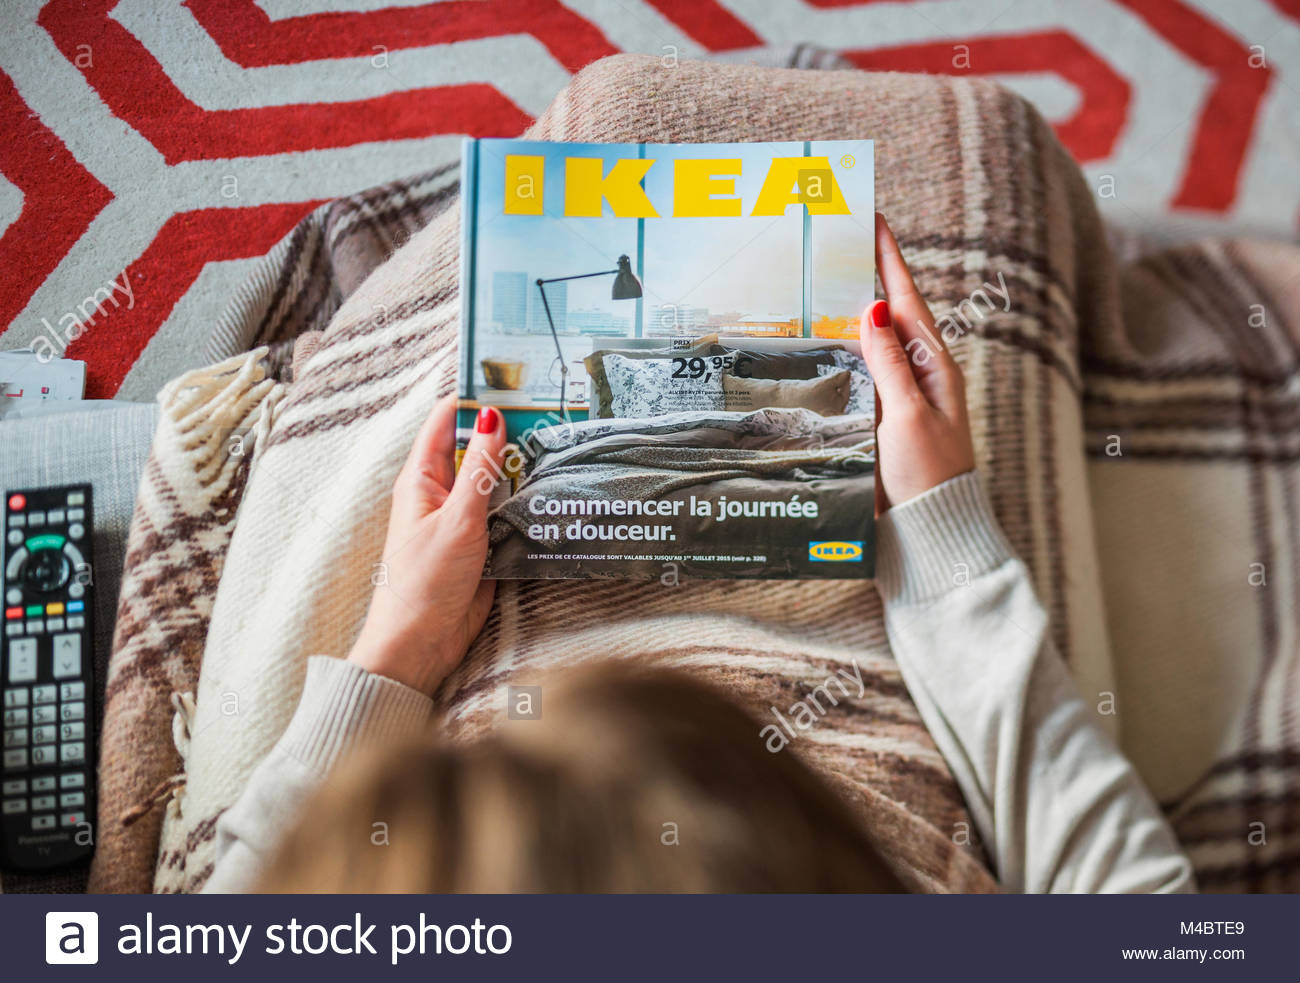 Woman reading IKEA catalog cover before furnishing house - Stock Image